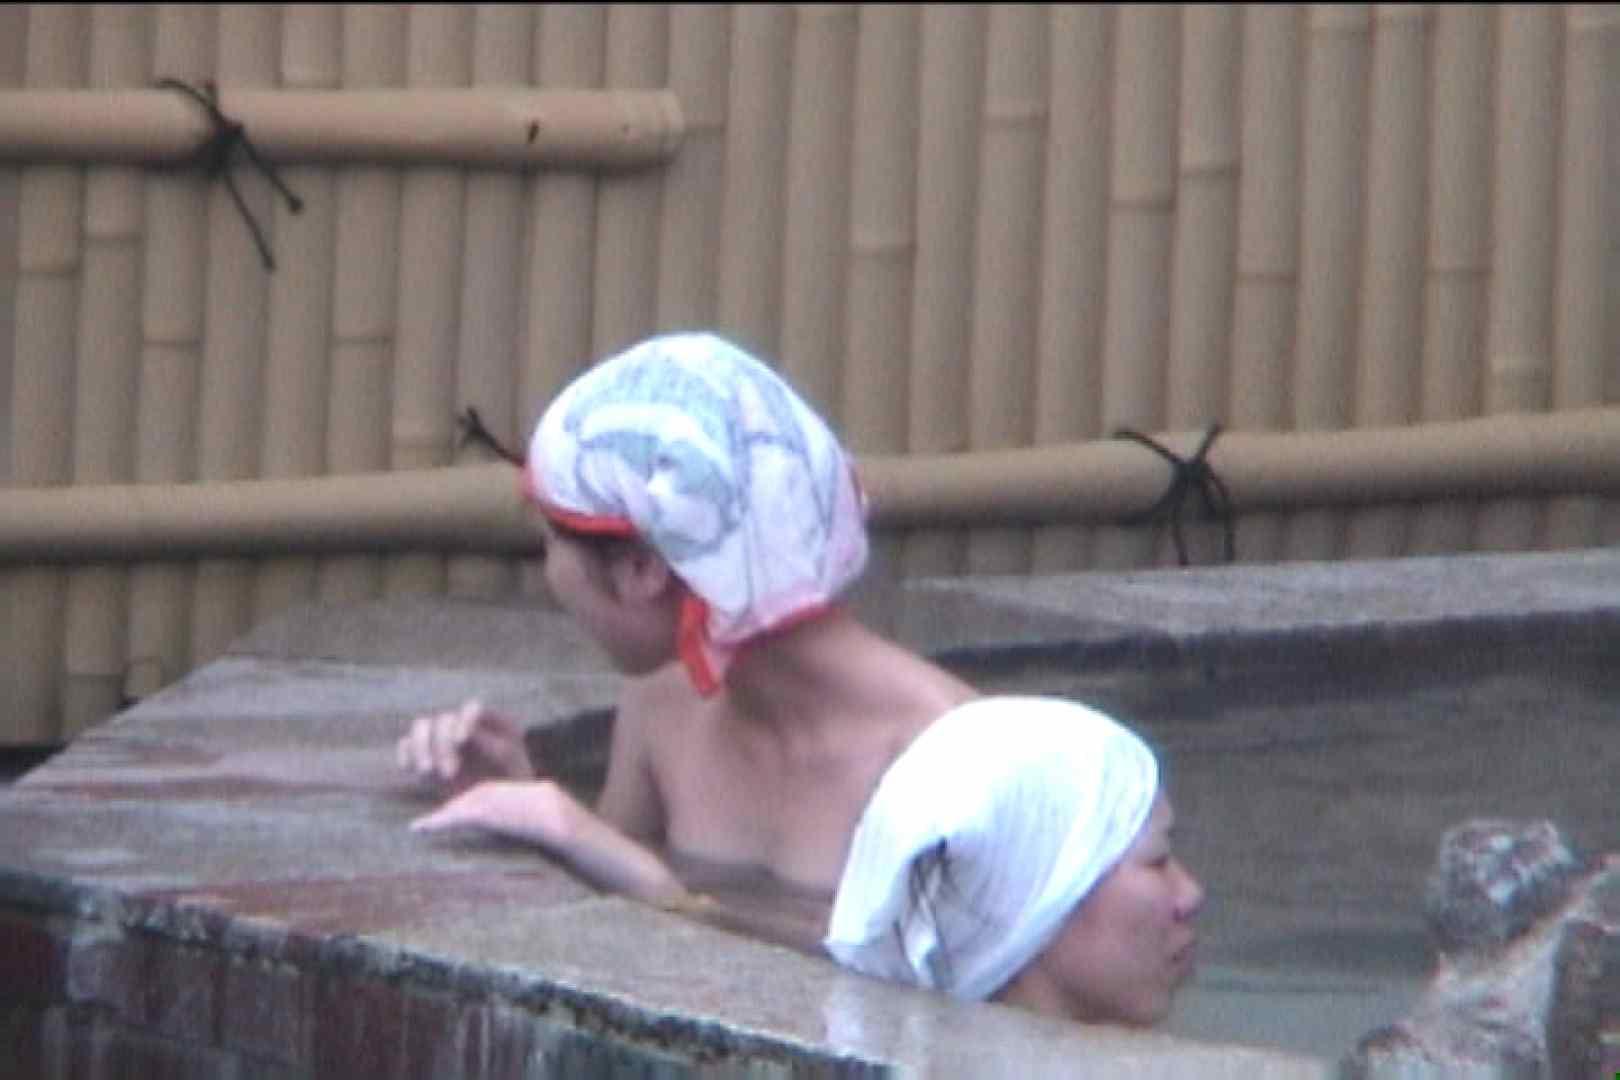 Aquaな露天風呂Vol.91【VIP限定】 盗撮師作品  77pic 27